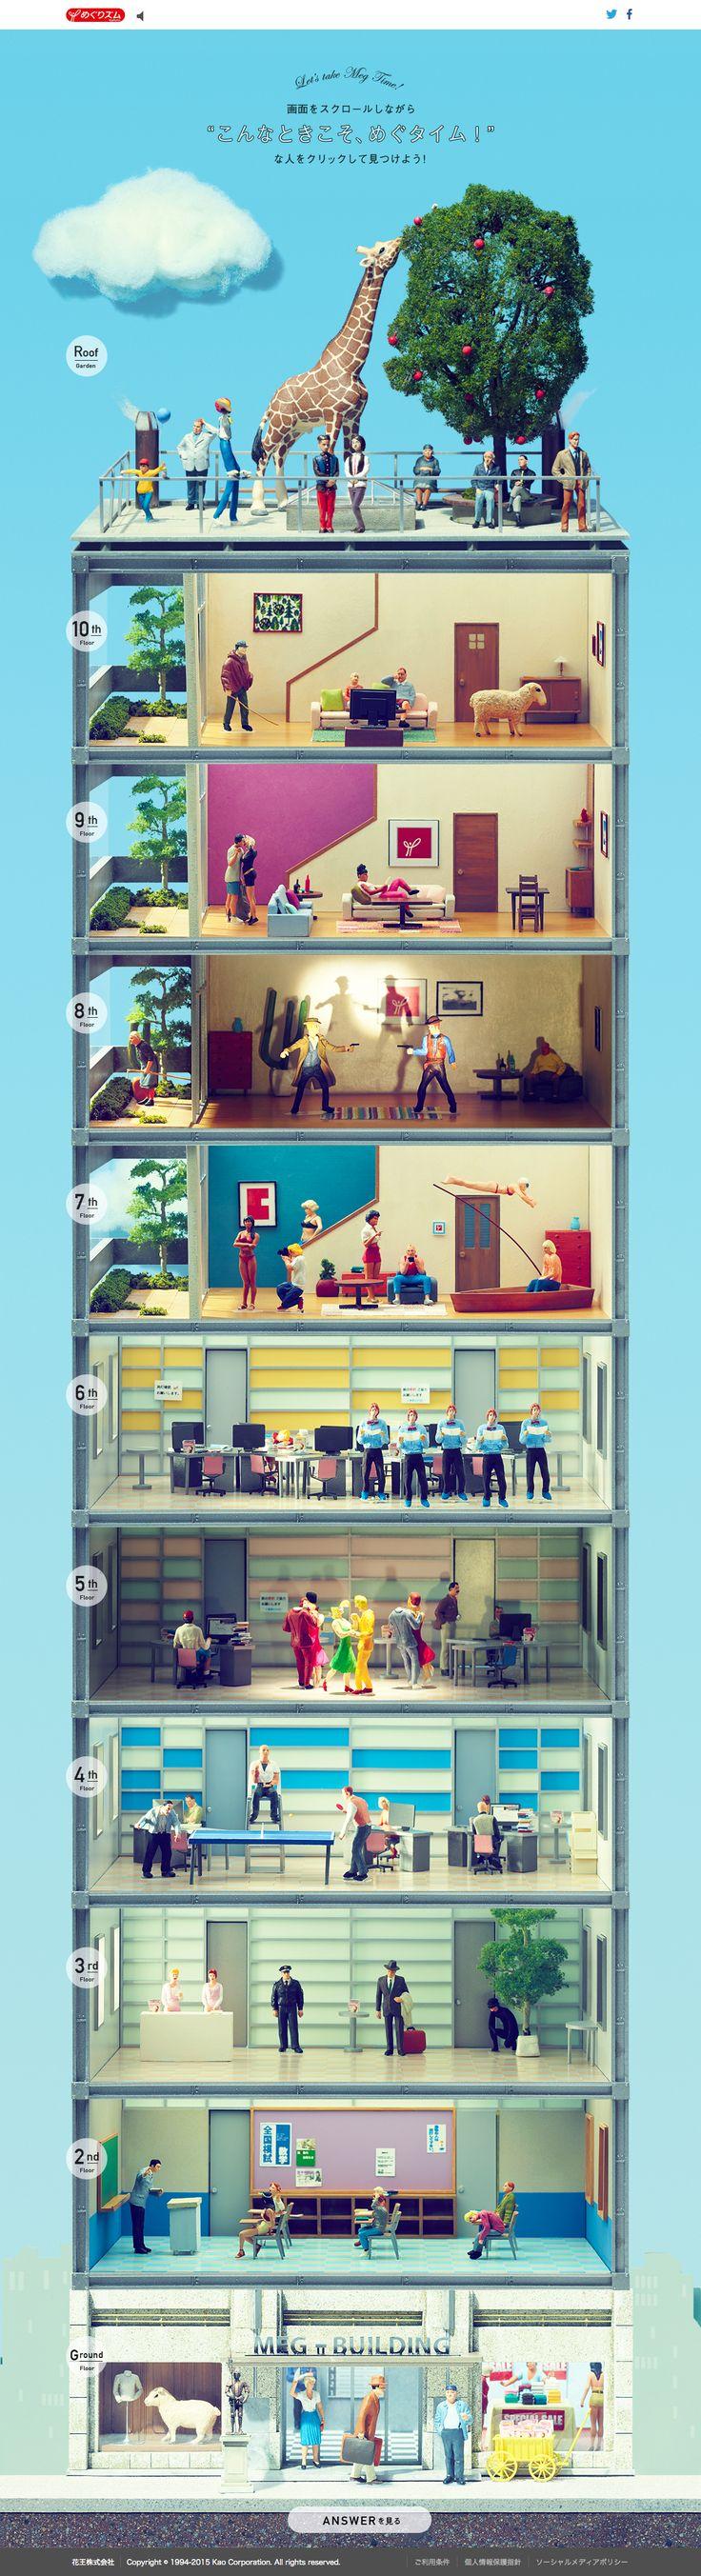 http://www.kao.co.jp/megrhythm/meg-building/